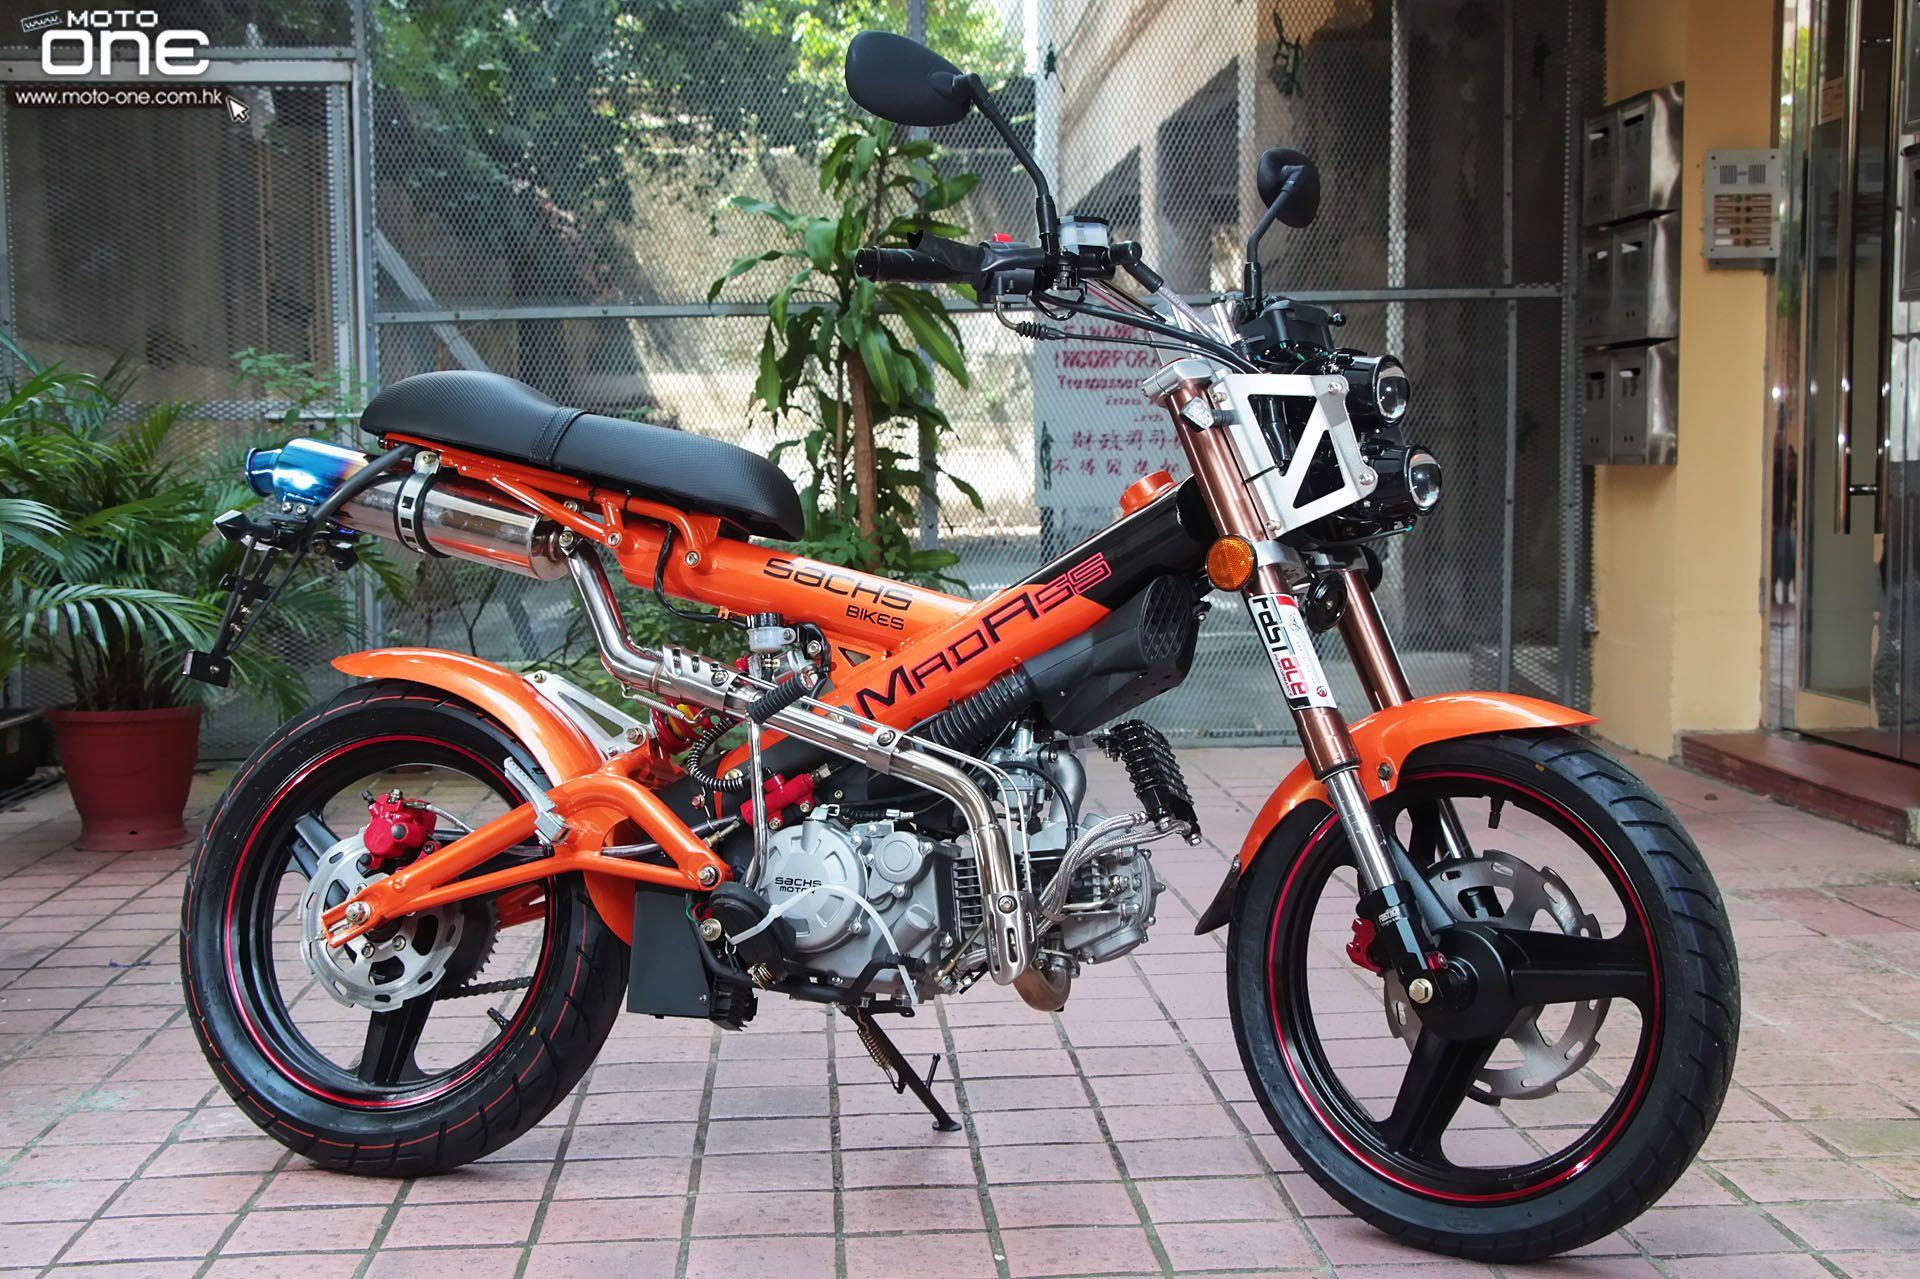 Moped licensemad ass bike